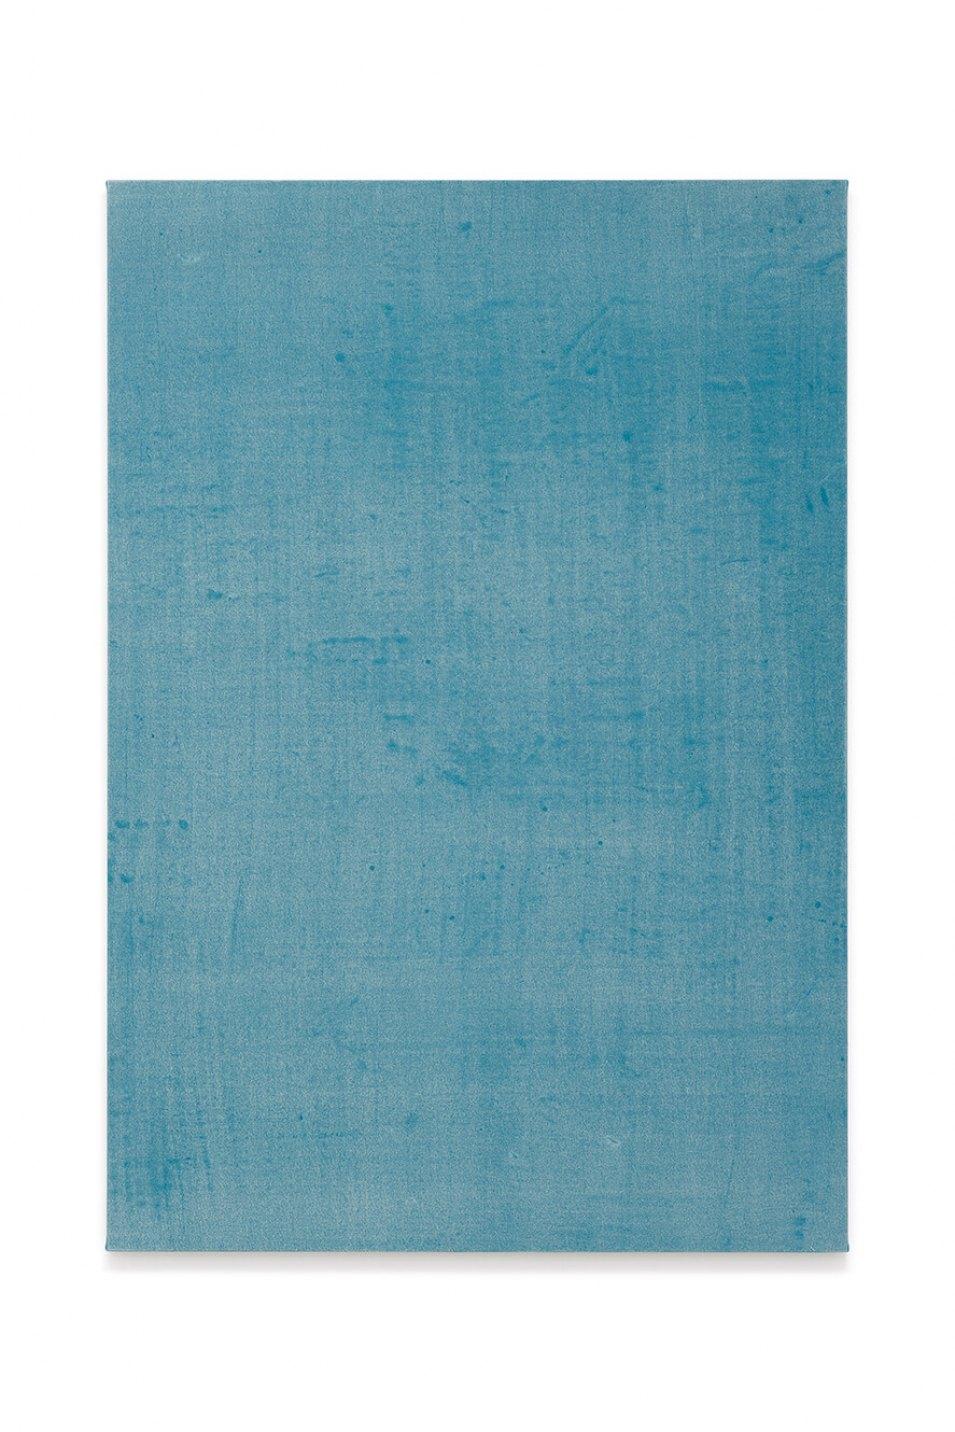 Francesco João Scavarda, <em>untitled (disturbing blue)</em>,2017,gouache on raw canvas,145 × 100 × 4 cm - Mendes Wood DM